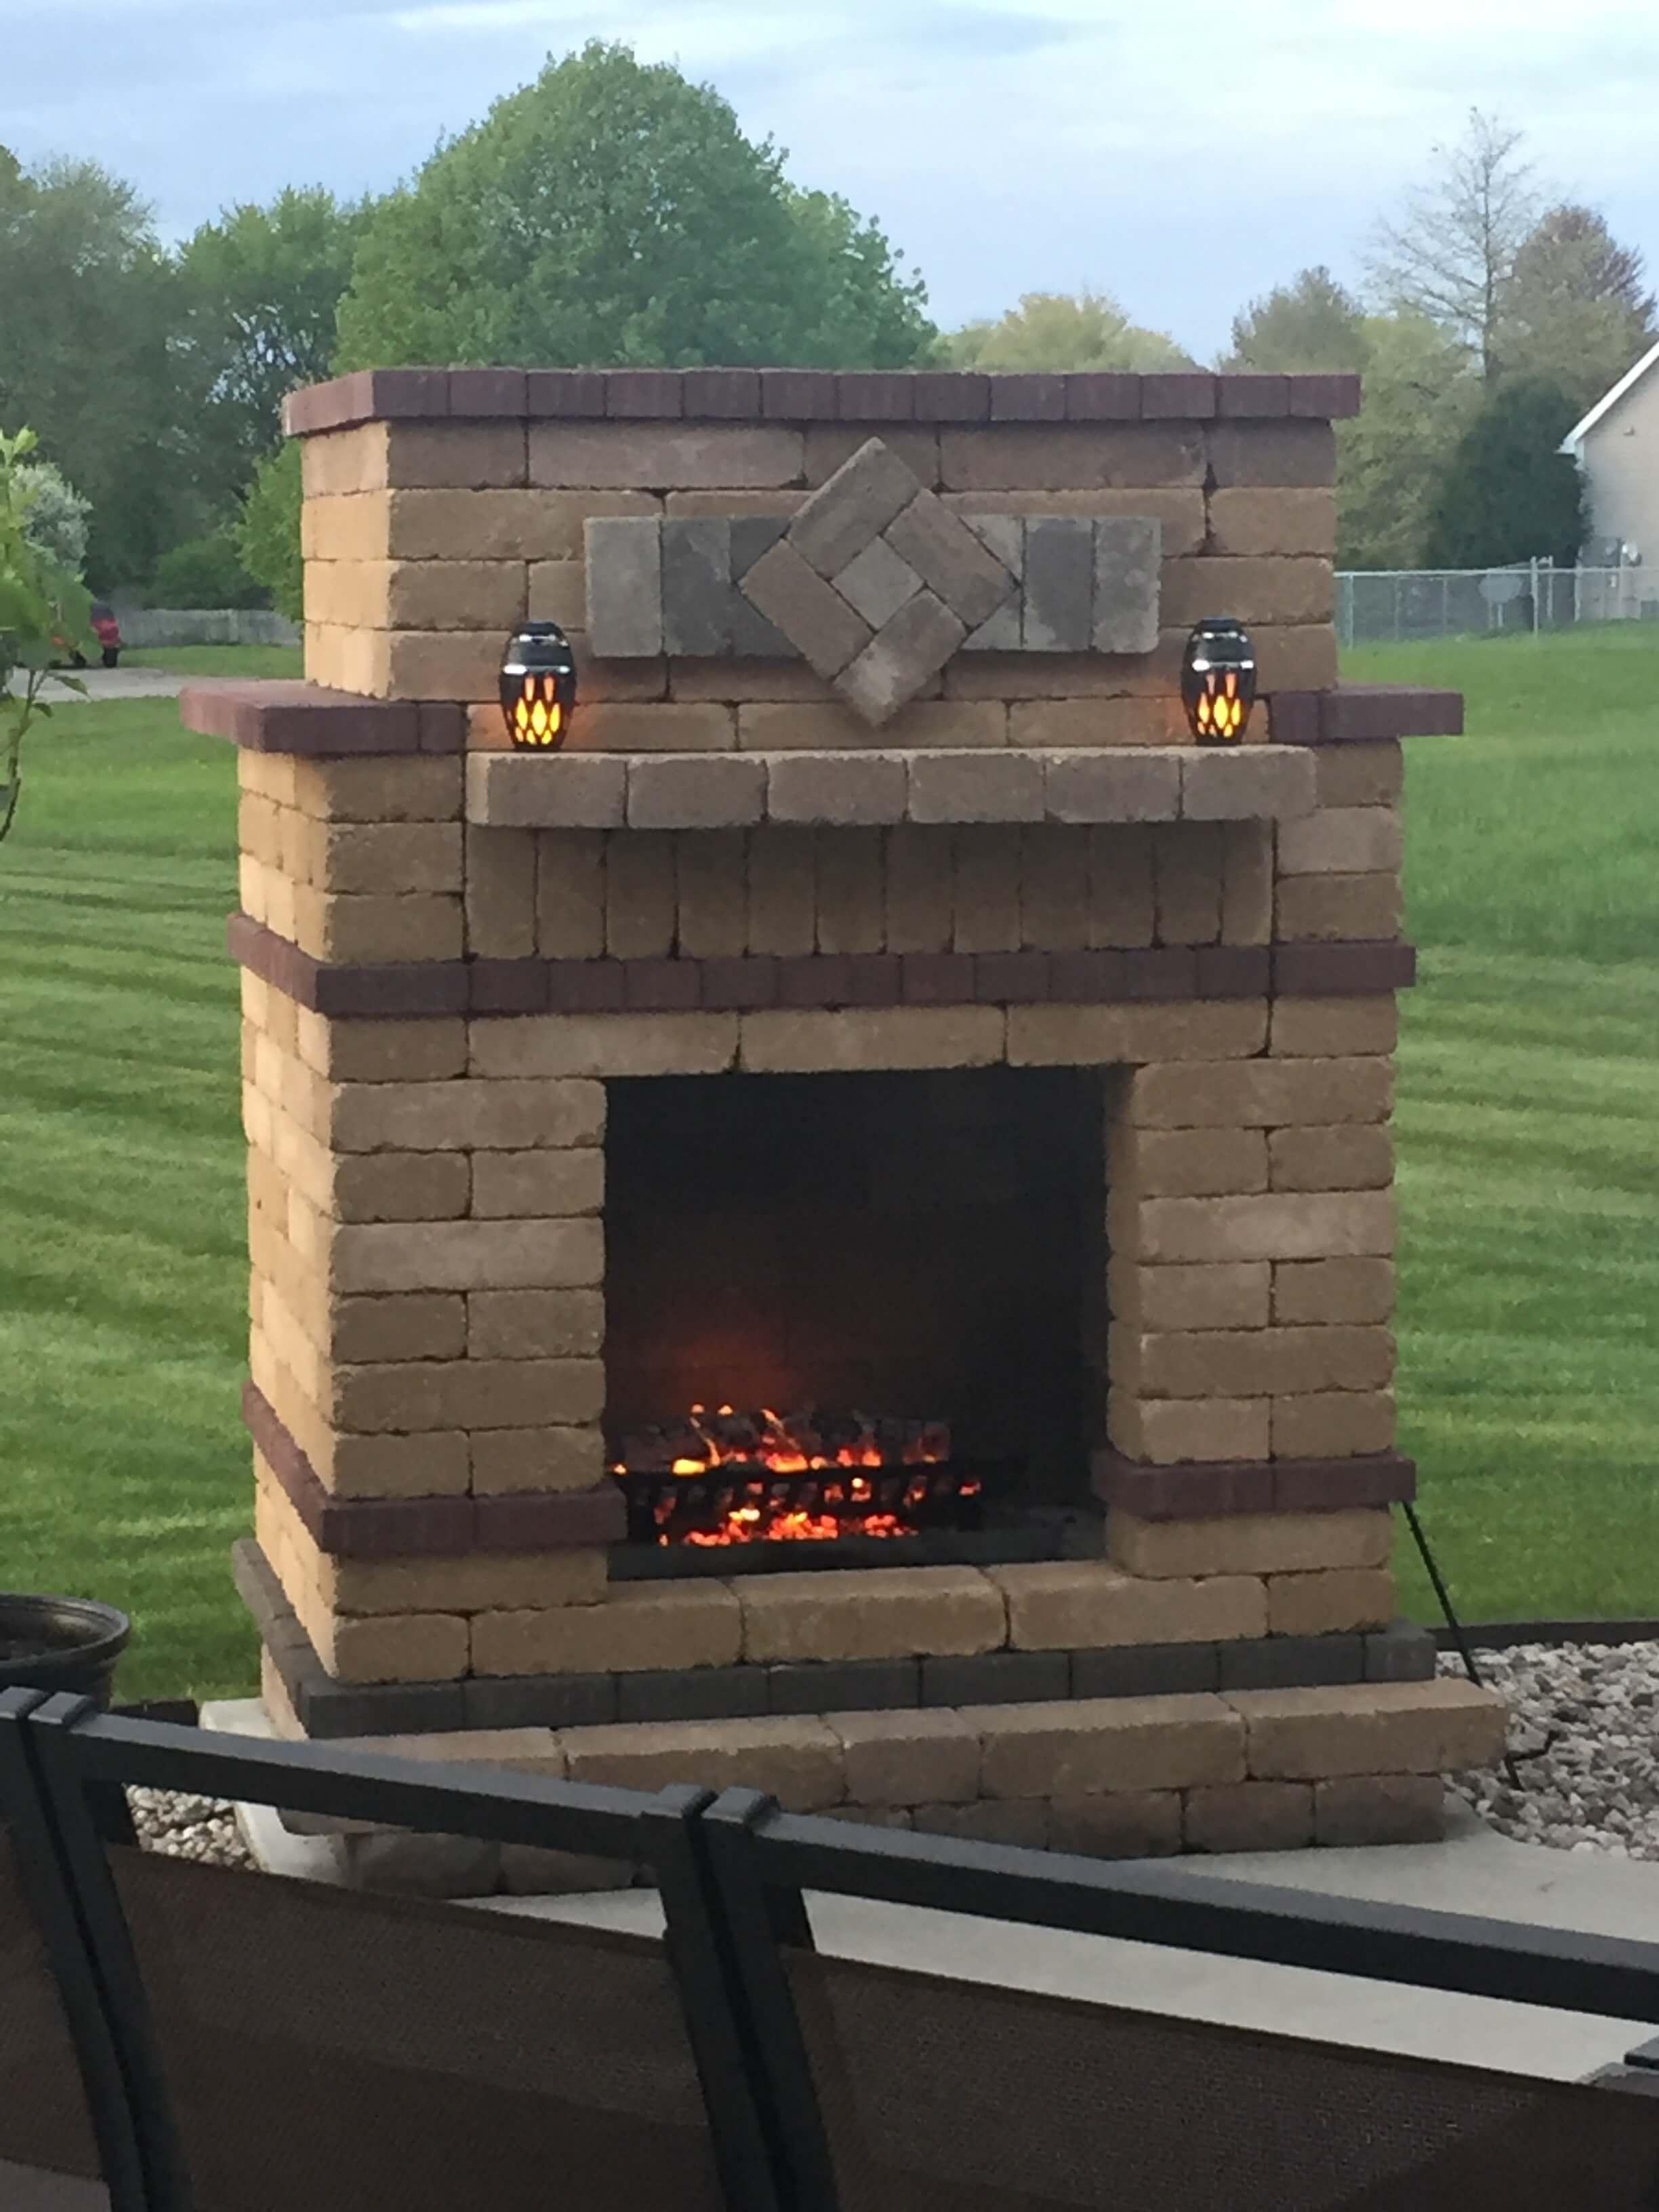 Brick fireplace outdoors.